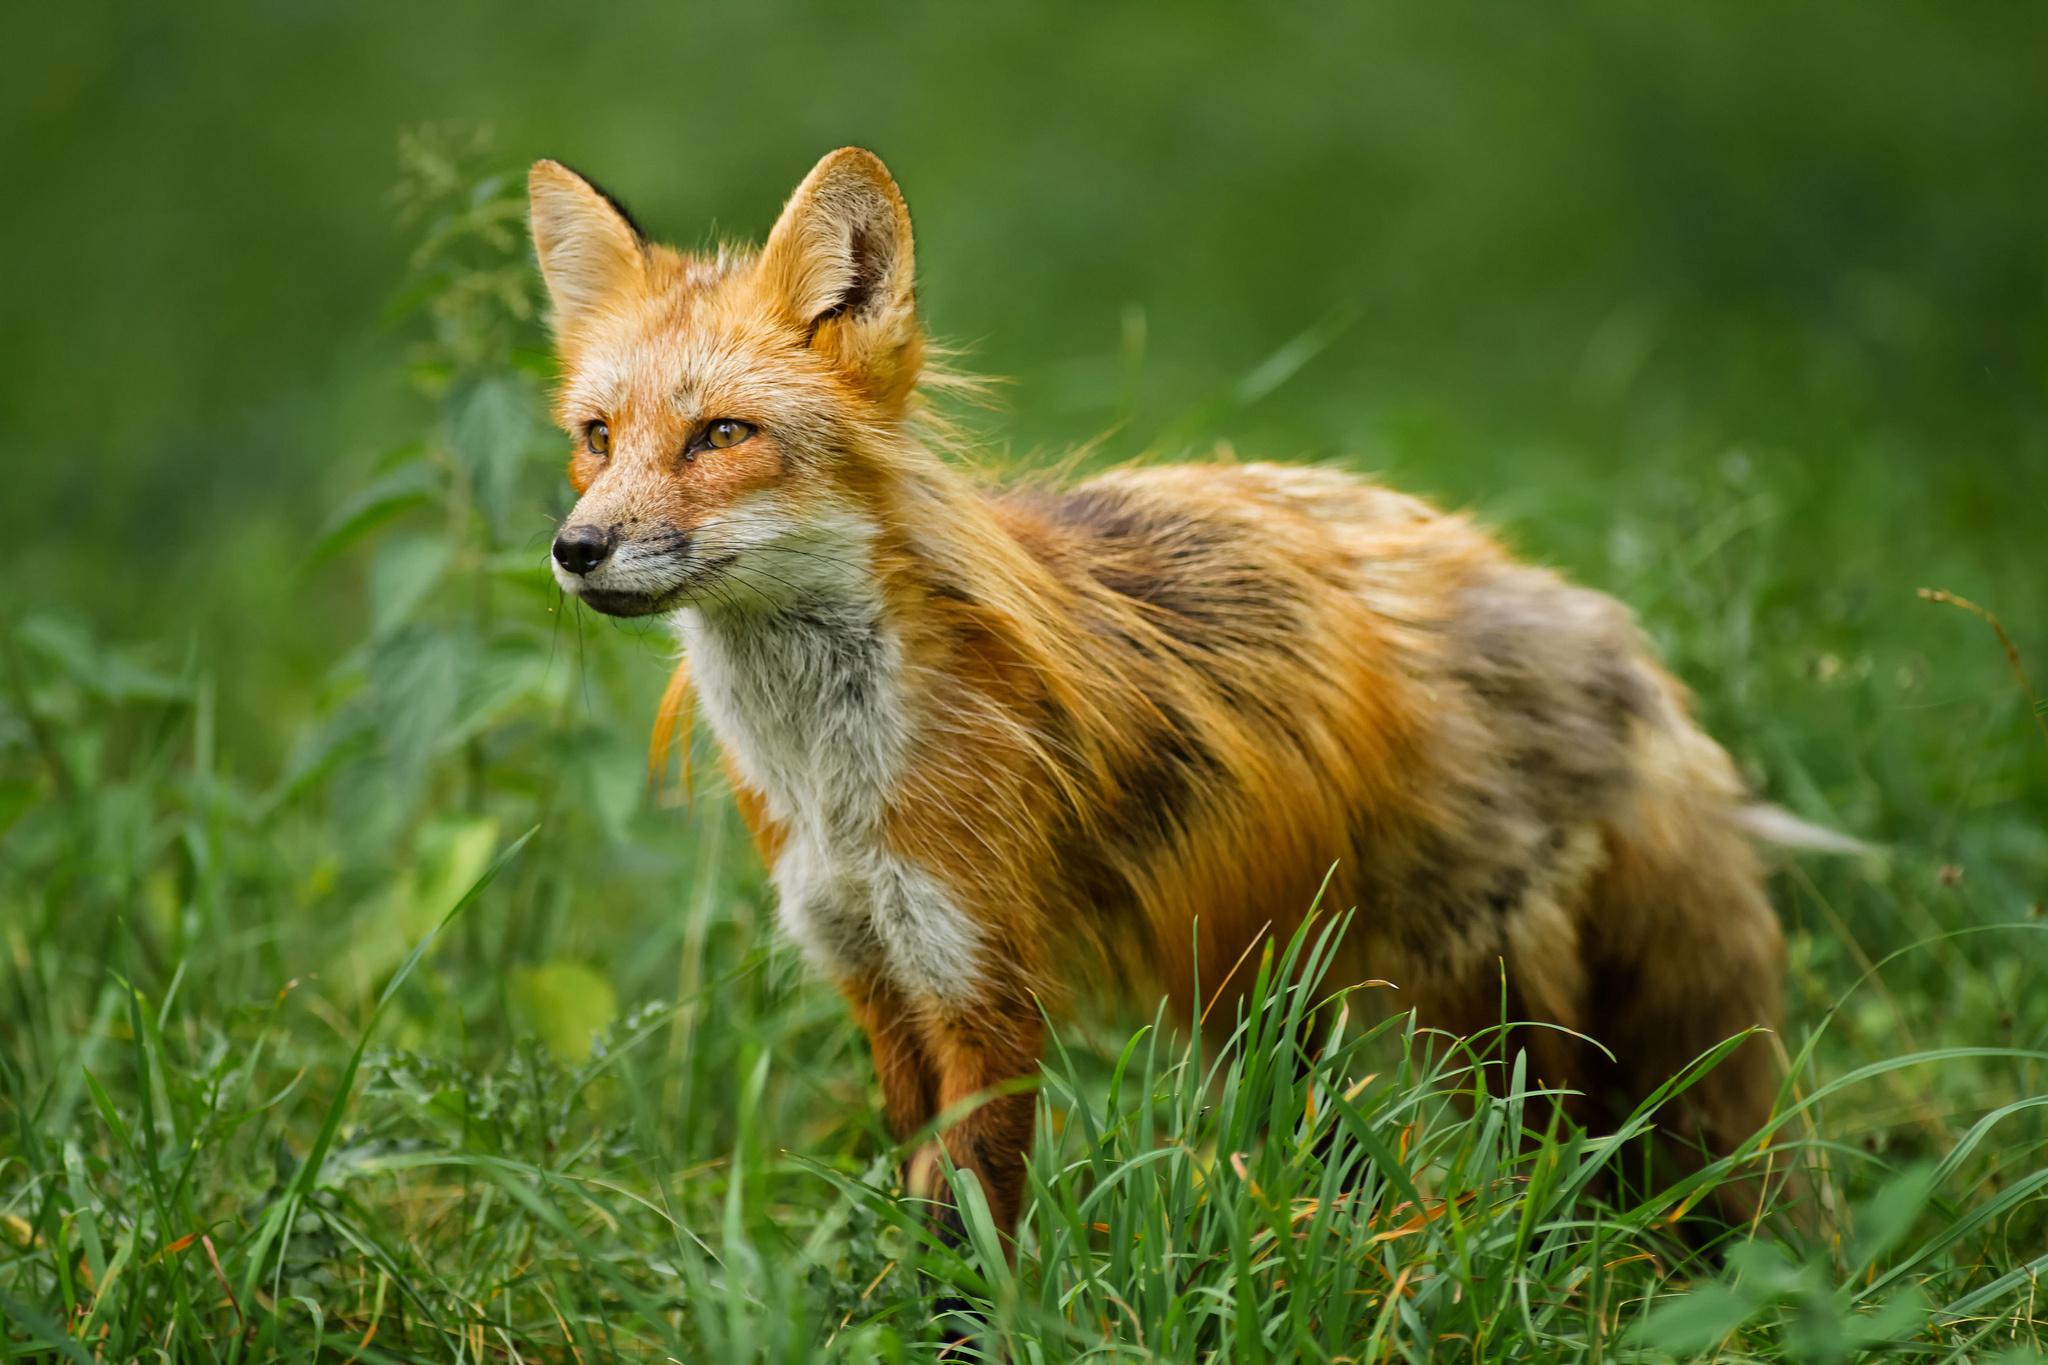 Download Wallpapers Download 2790x2547 Animals Grass: Red Grass Fox Wallpaper